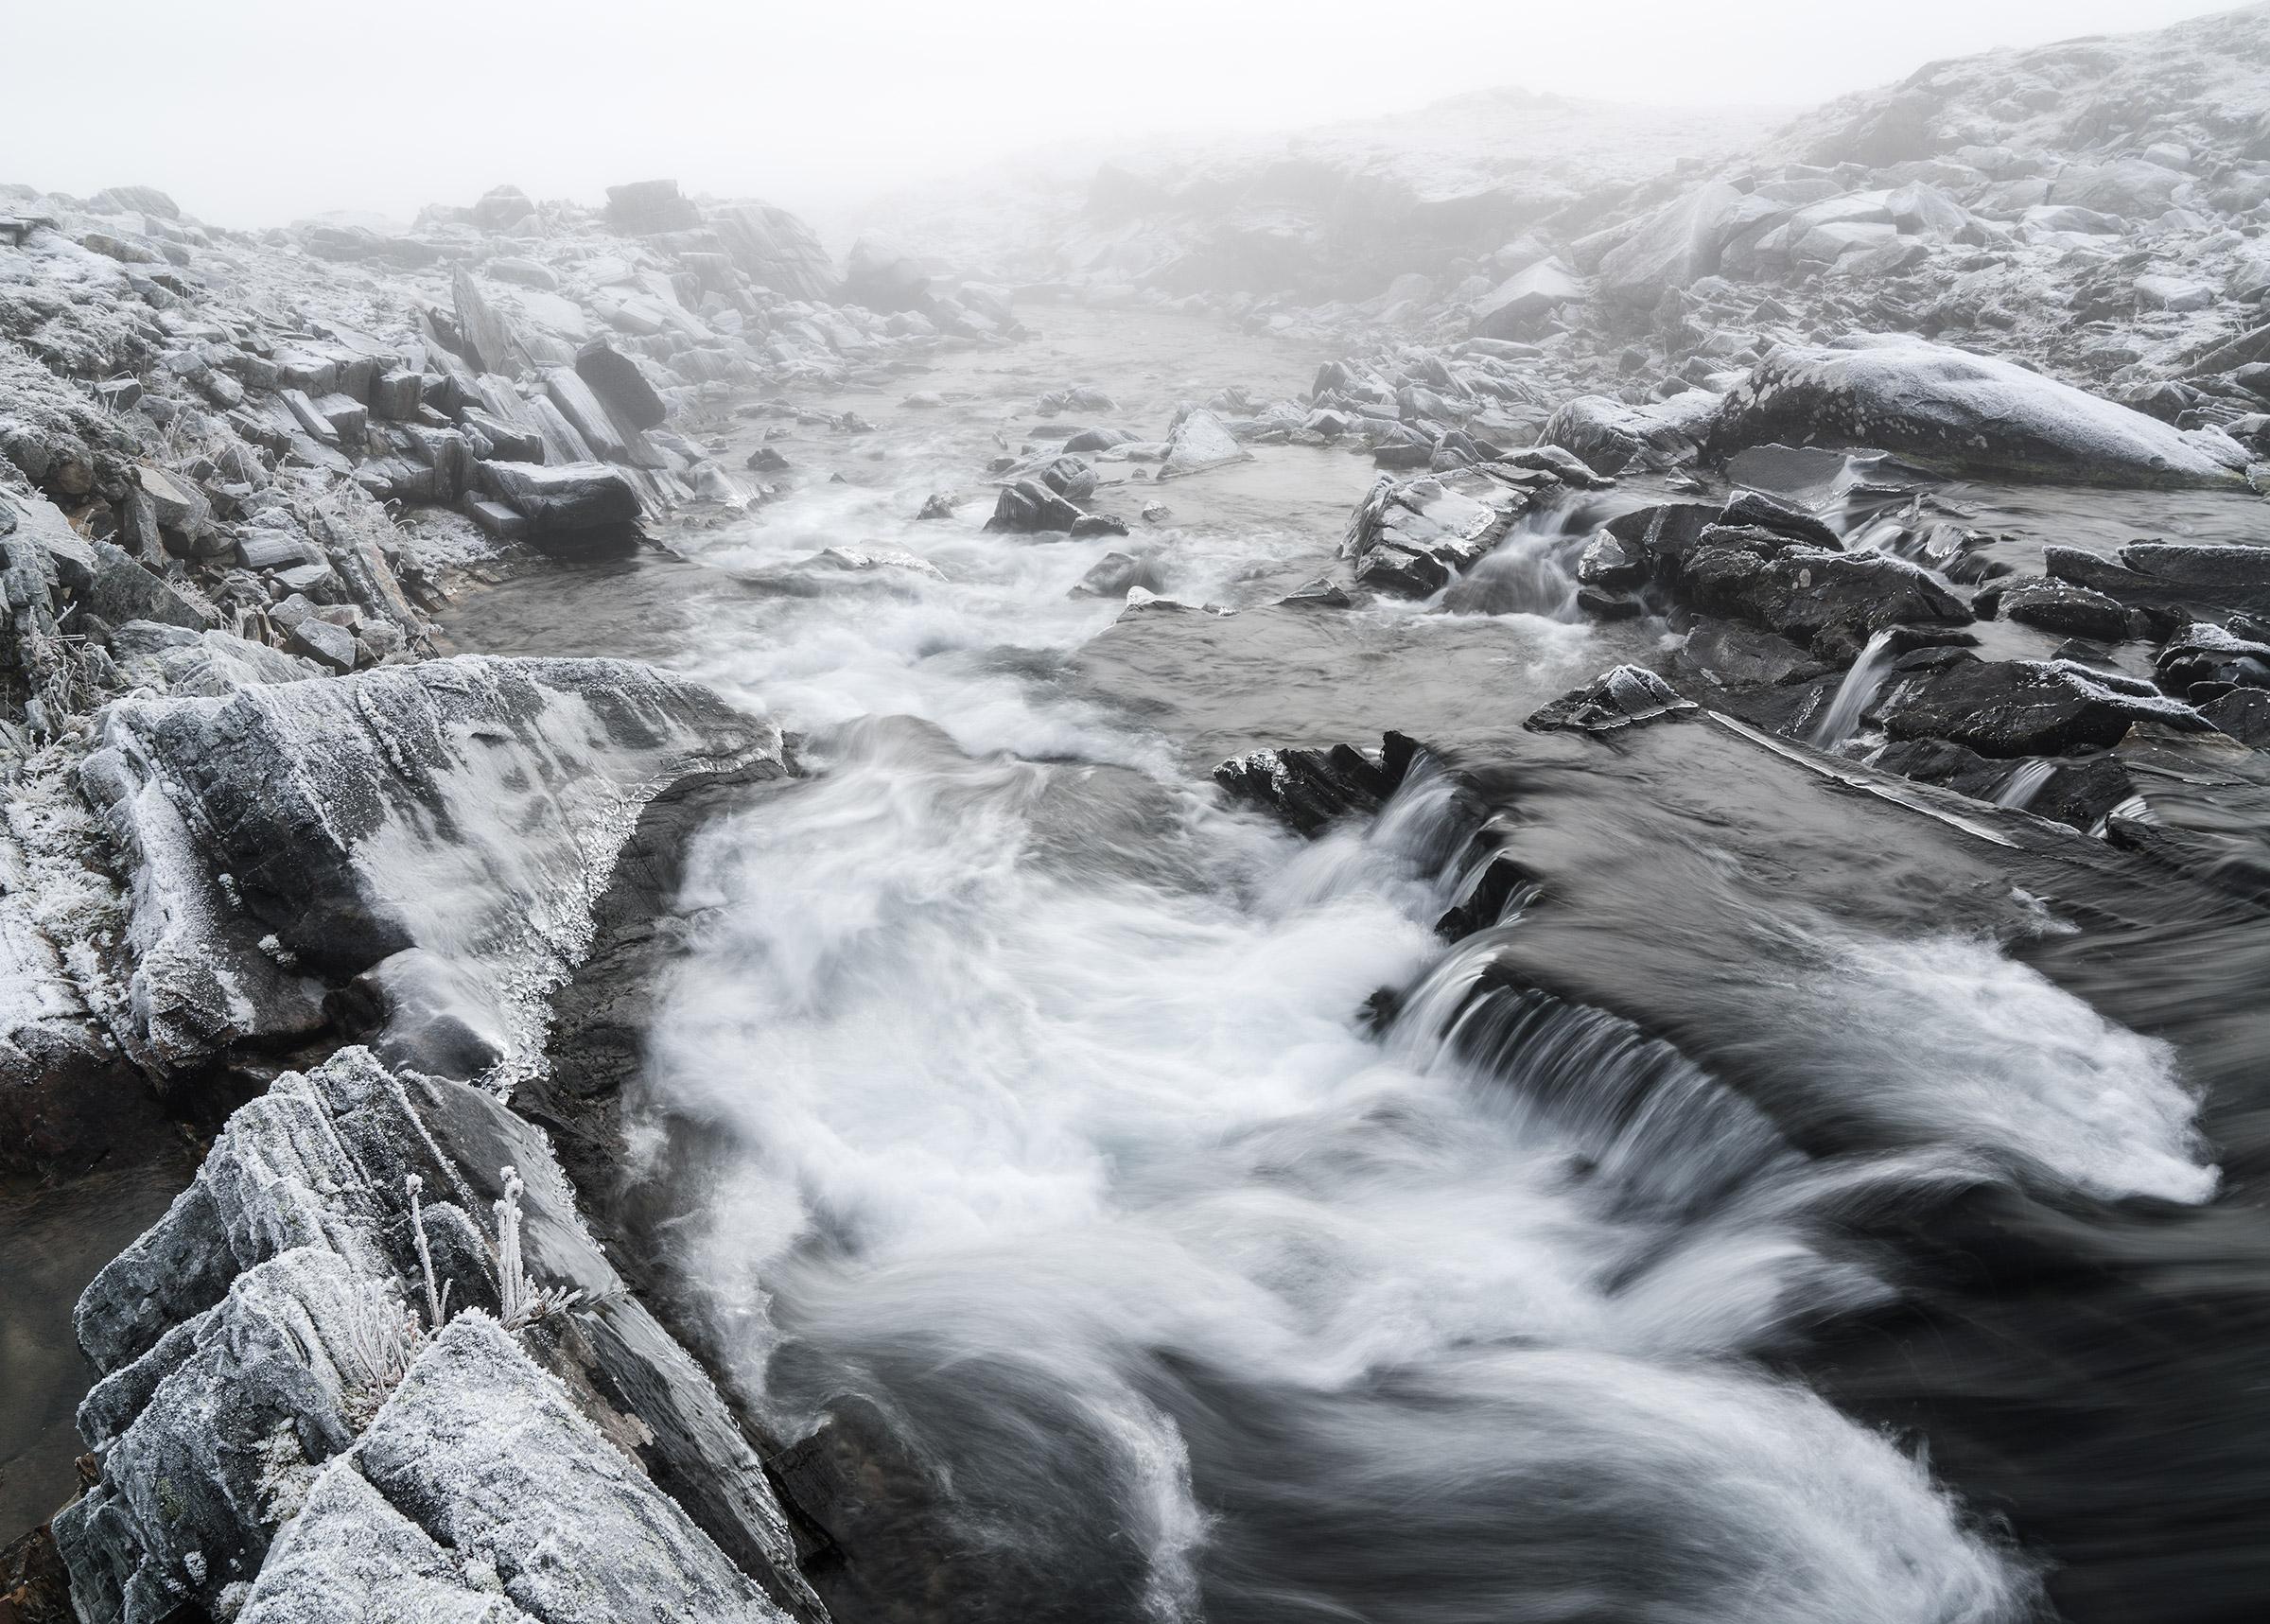 Frosty Stream – Sarek National Park